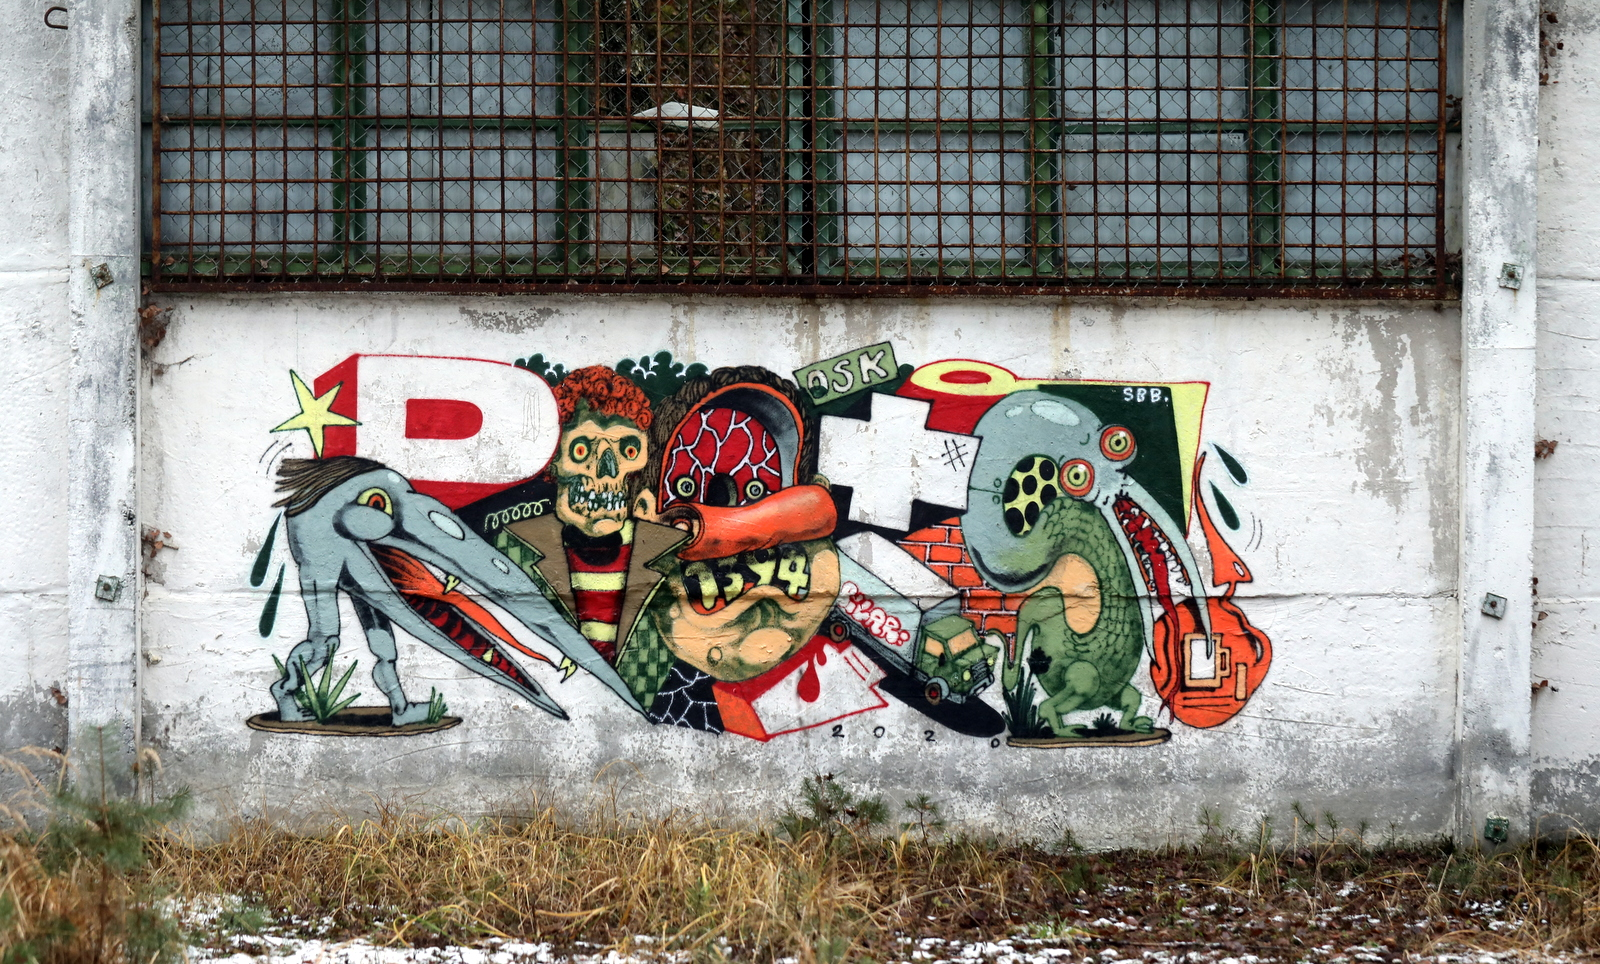 Grafitti Kunst an verlassenen Orten